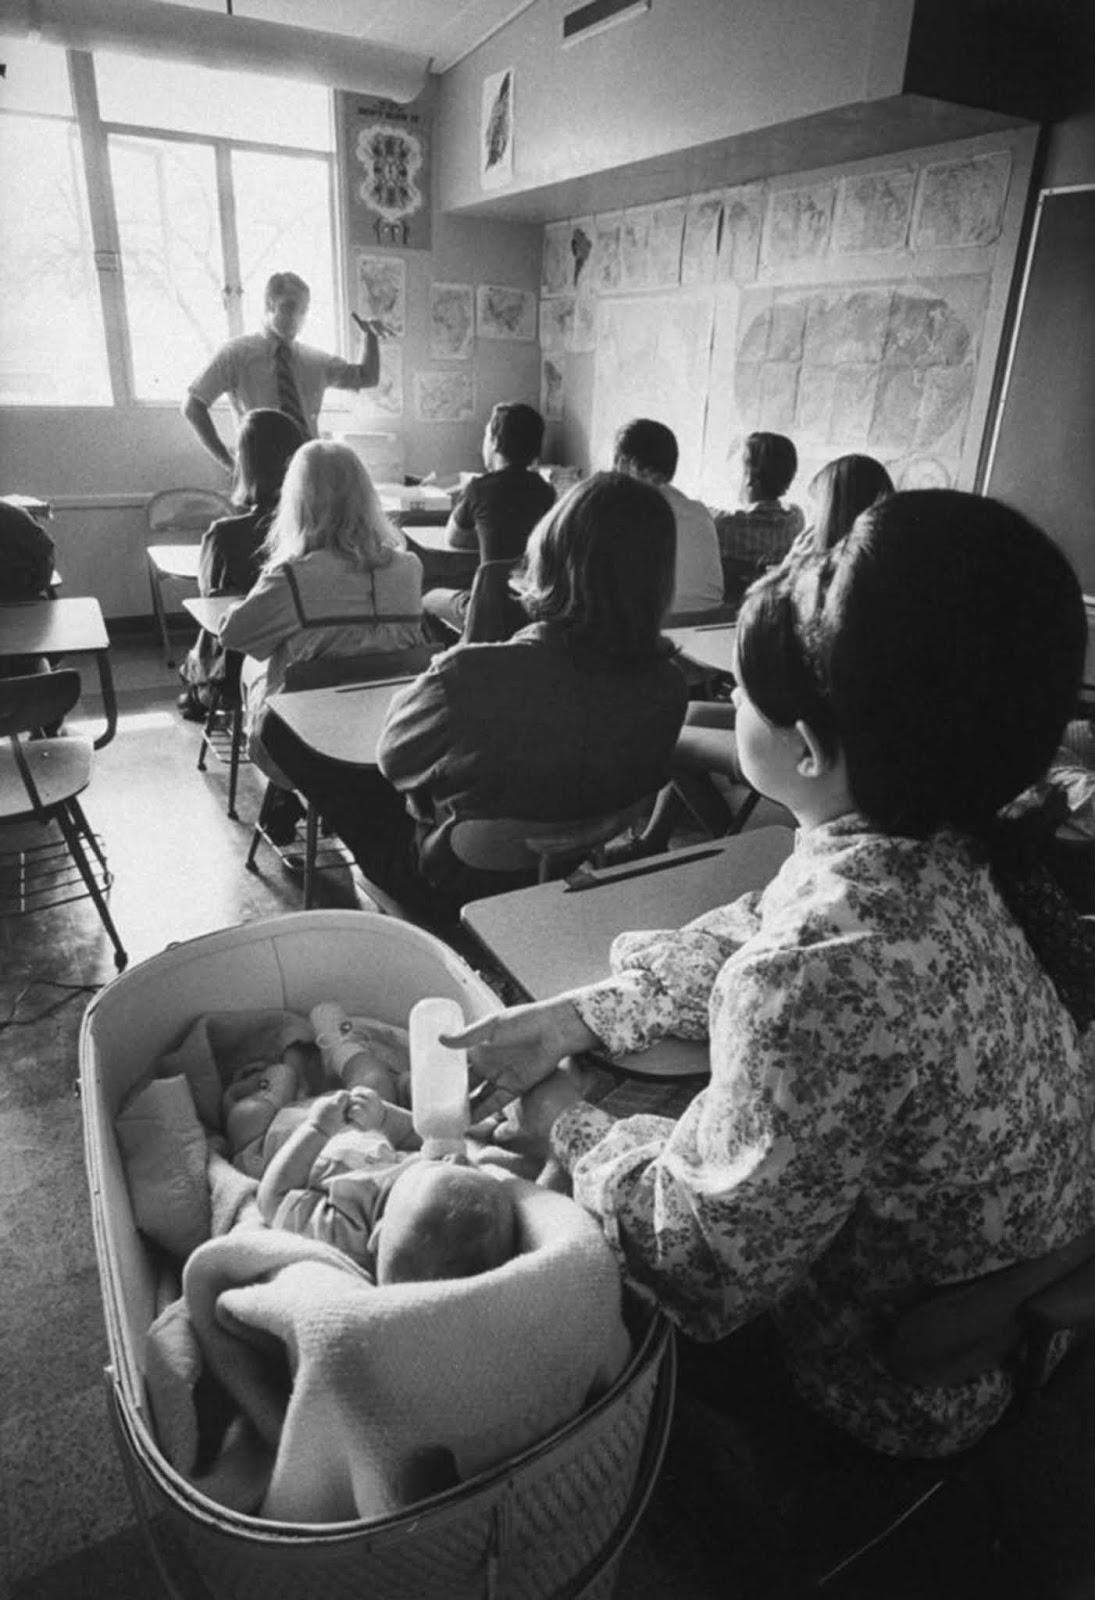 teen_pregnancy_1970s (4).jpg